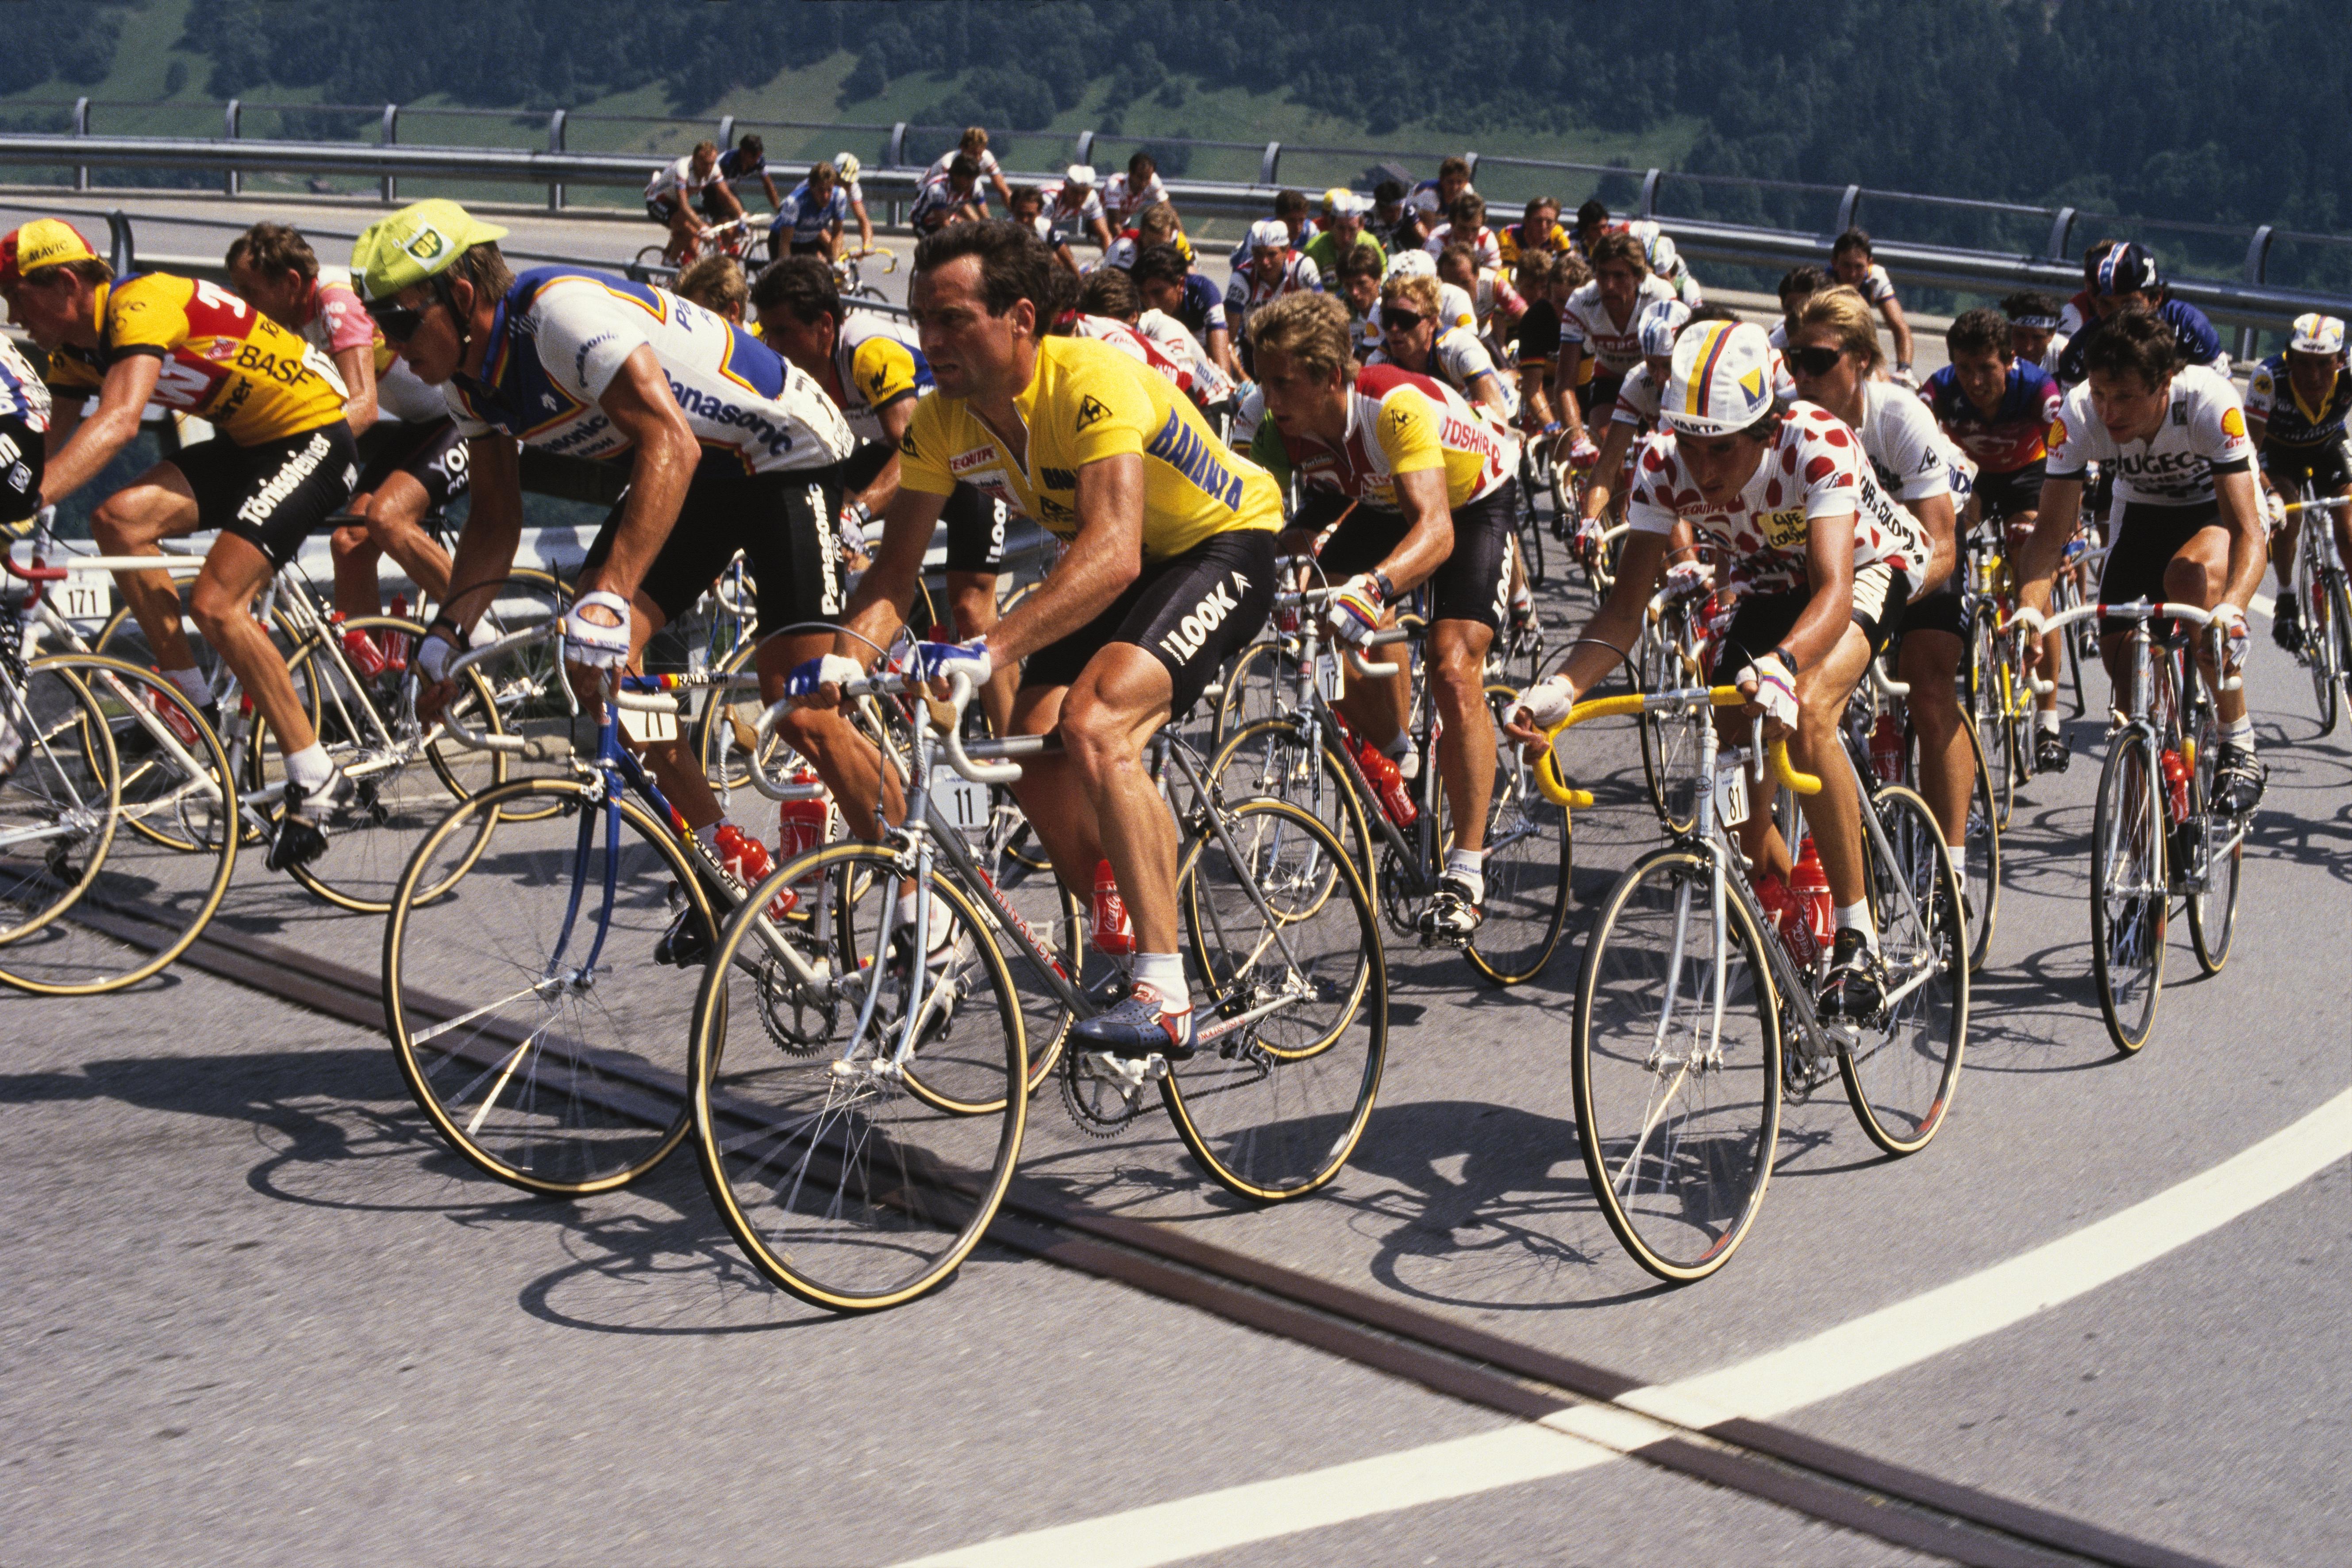 Tour de France, 1985: Phil Anderson, Bernard Hinault, Greg Lemond, and Luis Herrera